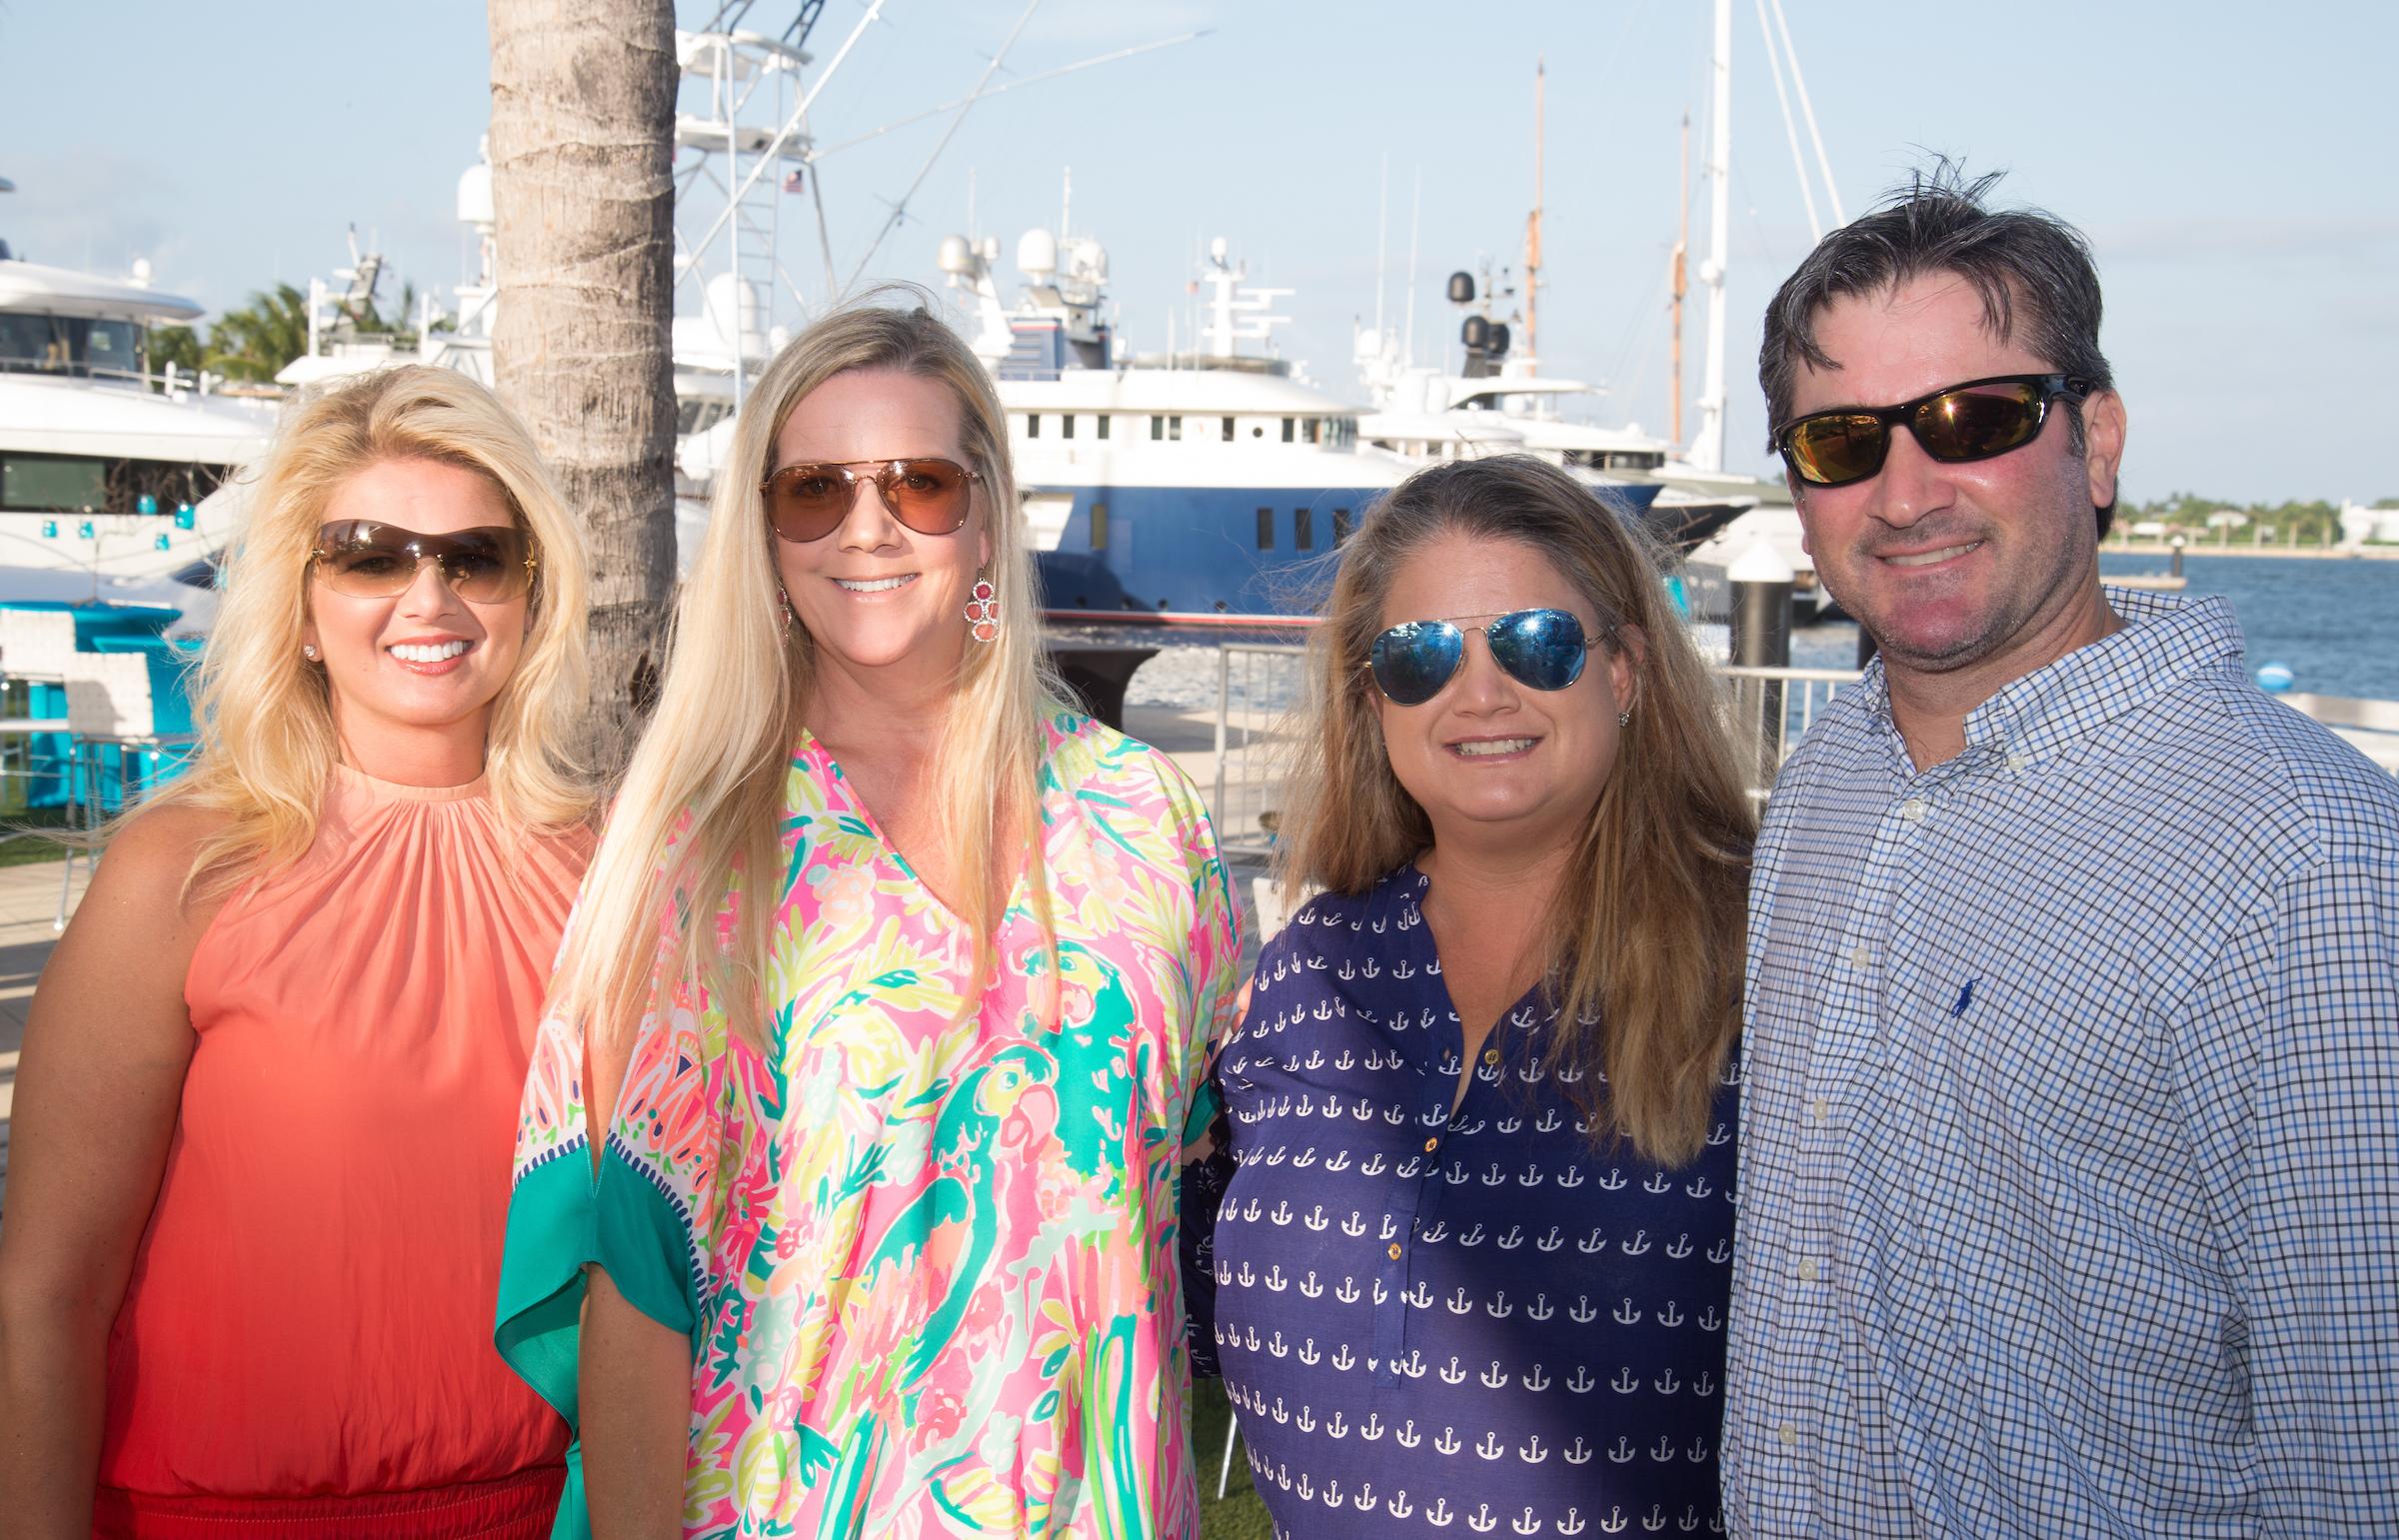 Clark-Cari rentas, Julia Wade, Rebecca and Lee Seelig.jpg